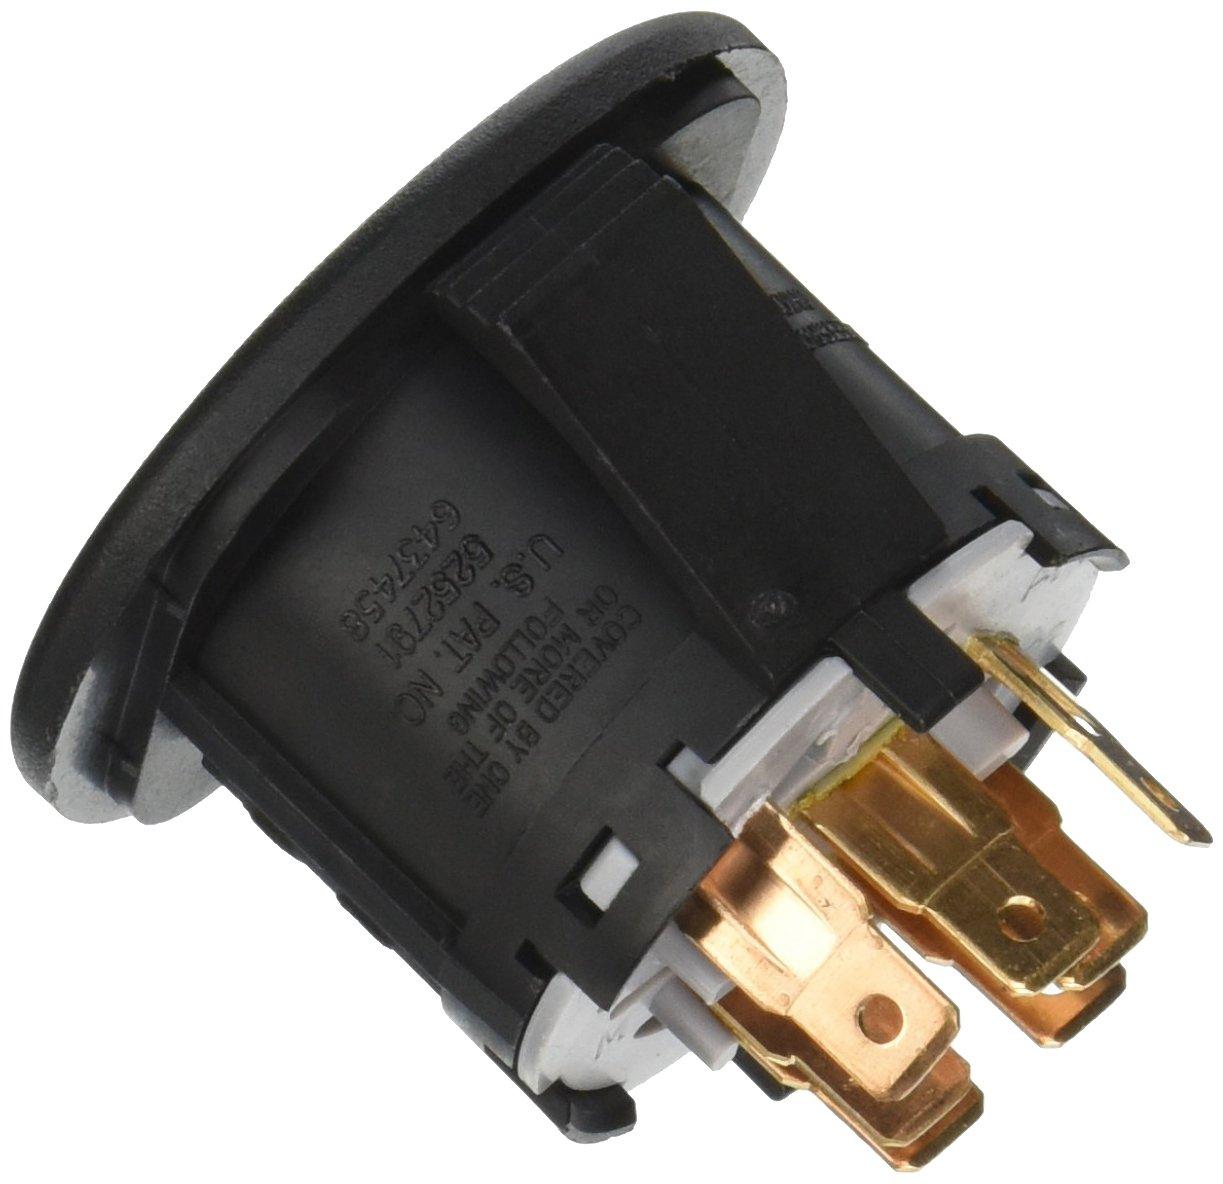 Stens 430 445 Starter Switch Replaces Mtd 925 1741 Murray 94762ma Ayp Wiring Harness 175566 175442 John Deere Gy20074 Husqvarna 532 17 55 66 94762 163968